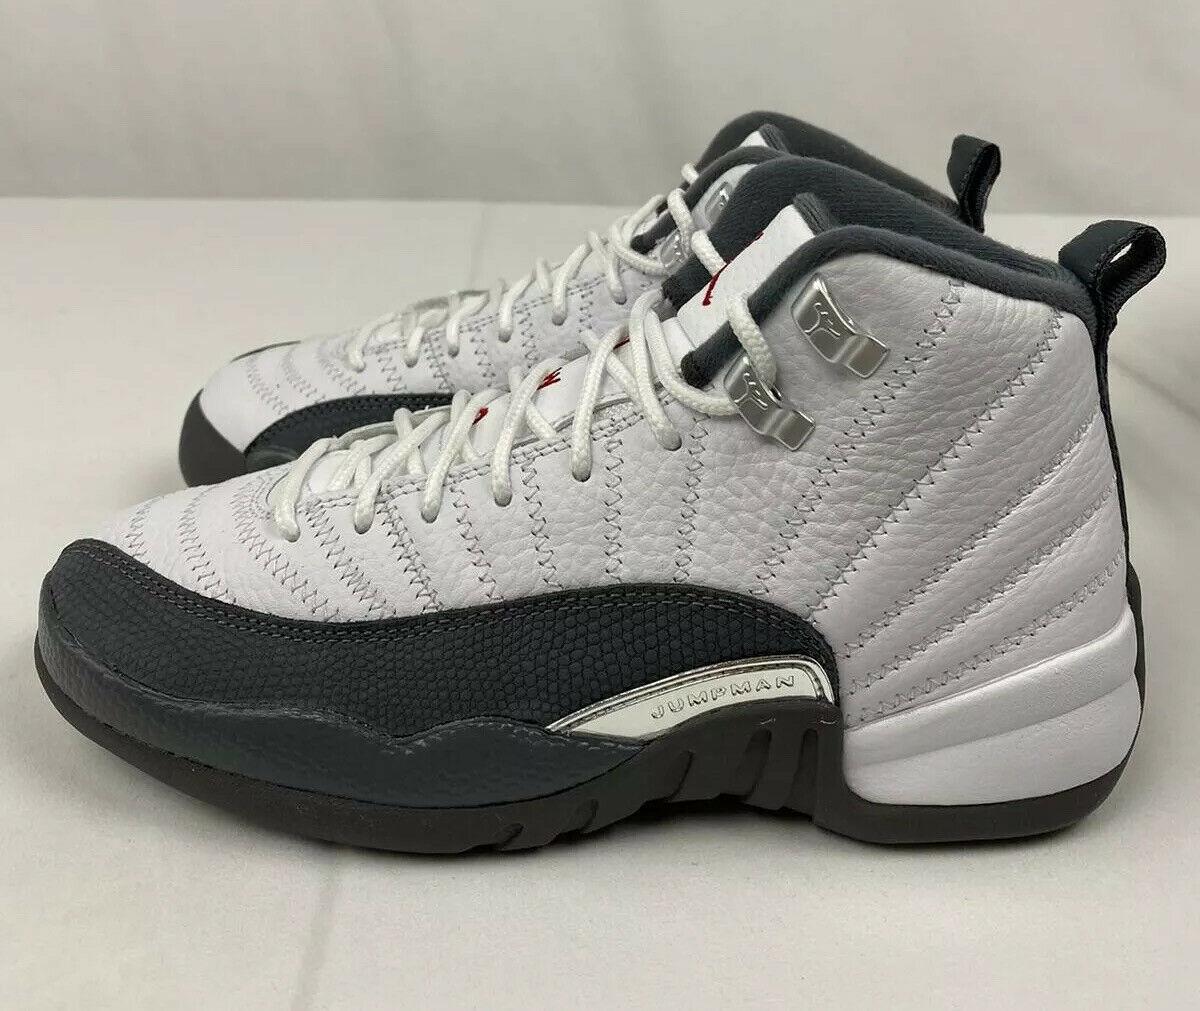 Jordan 12 Retro White Dark Grey GS